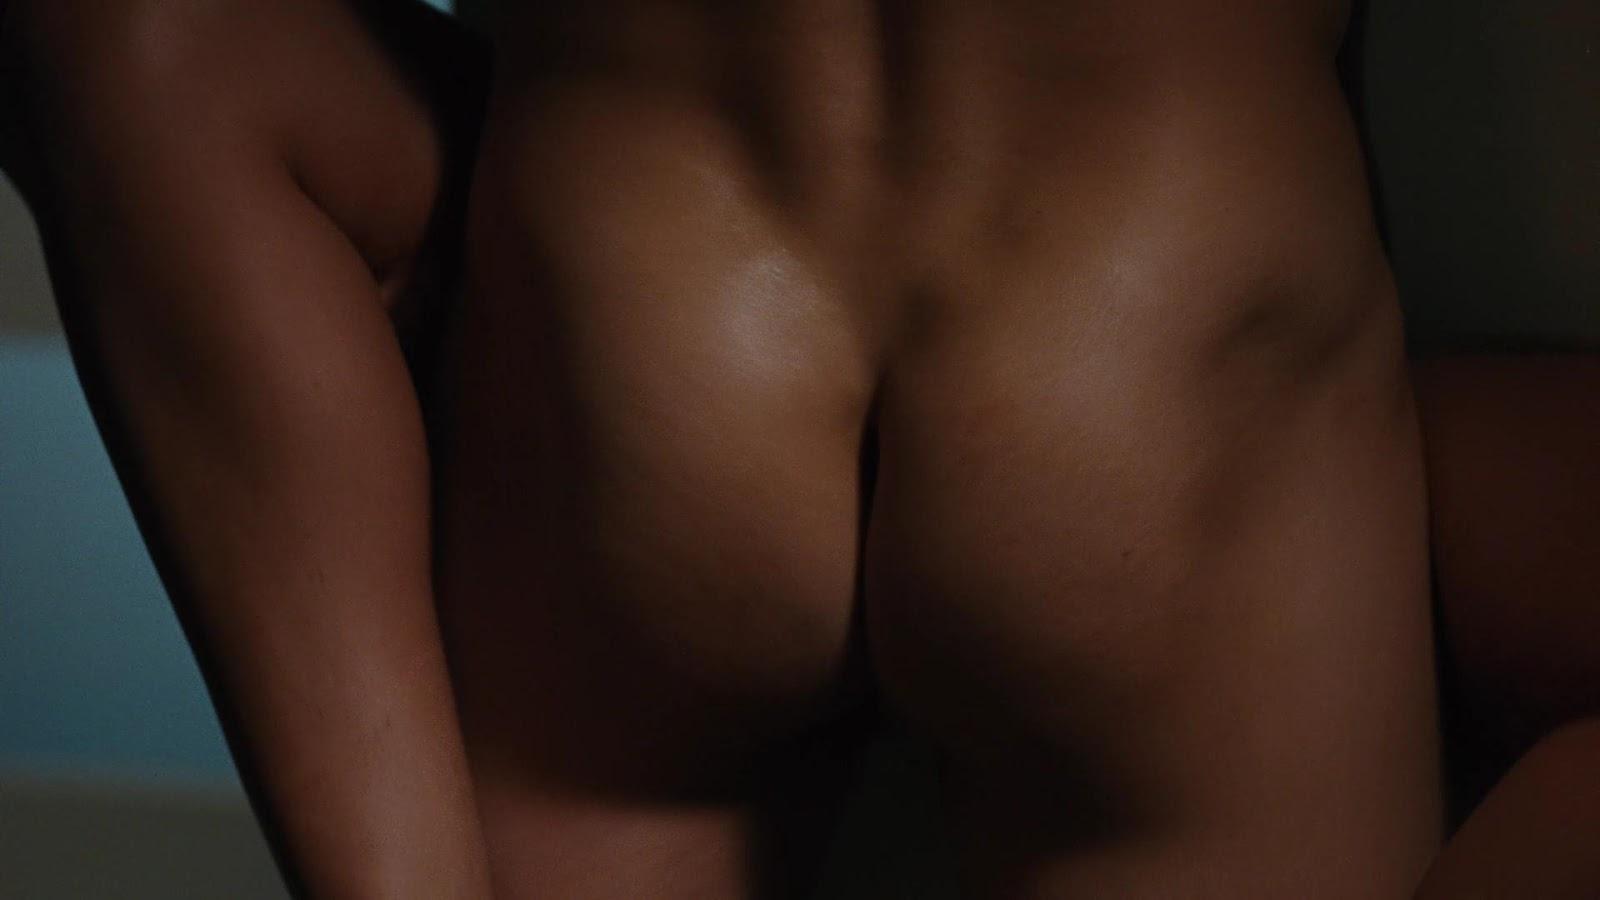 Gilles marini SEX hot man - YouTube